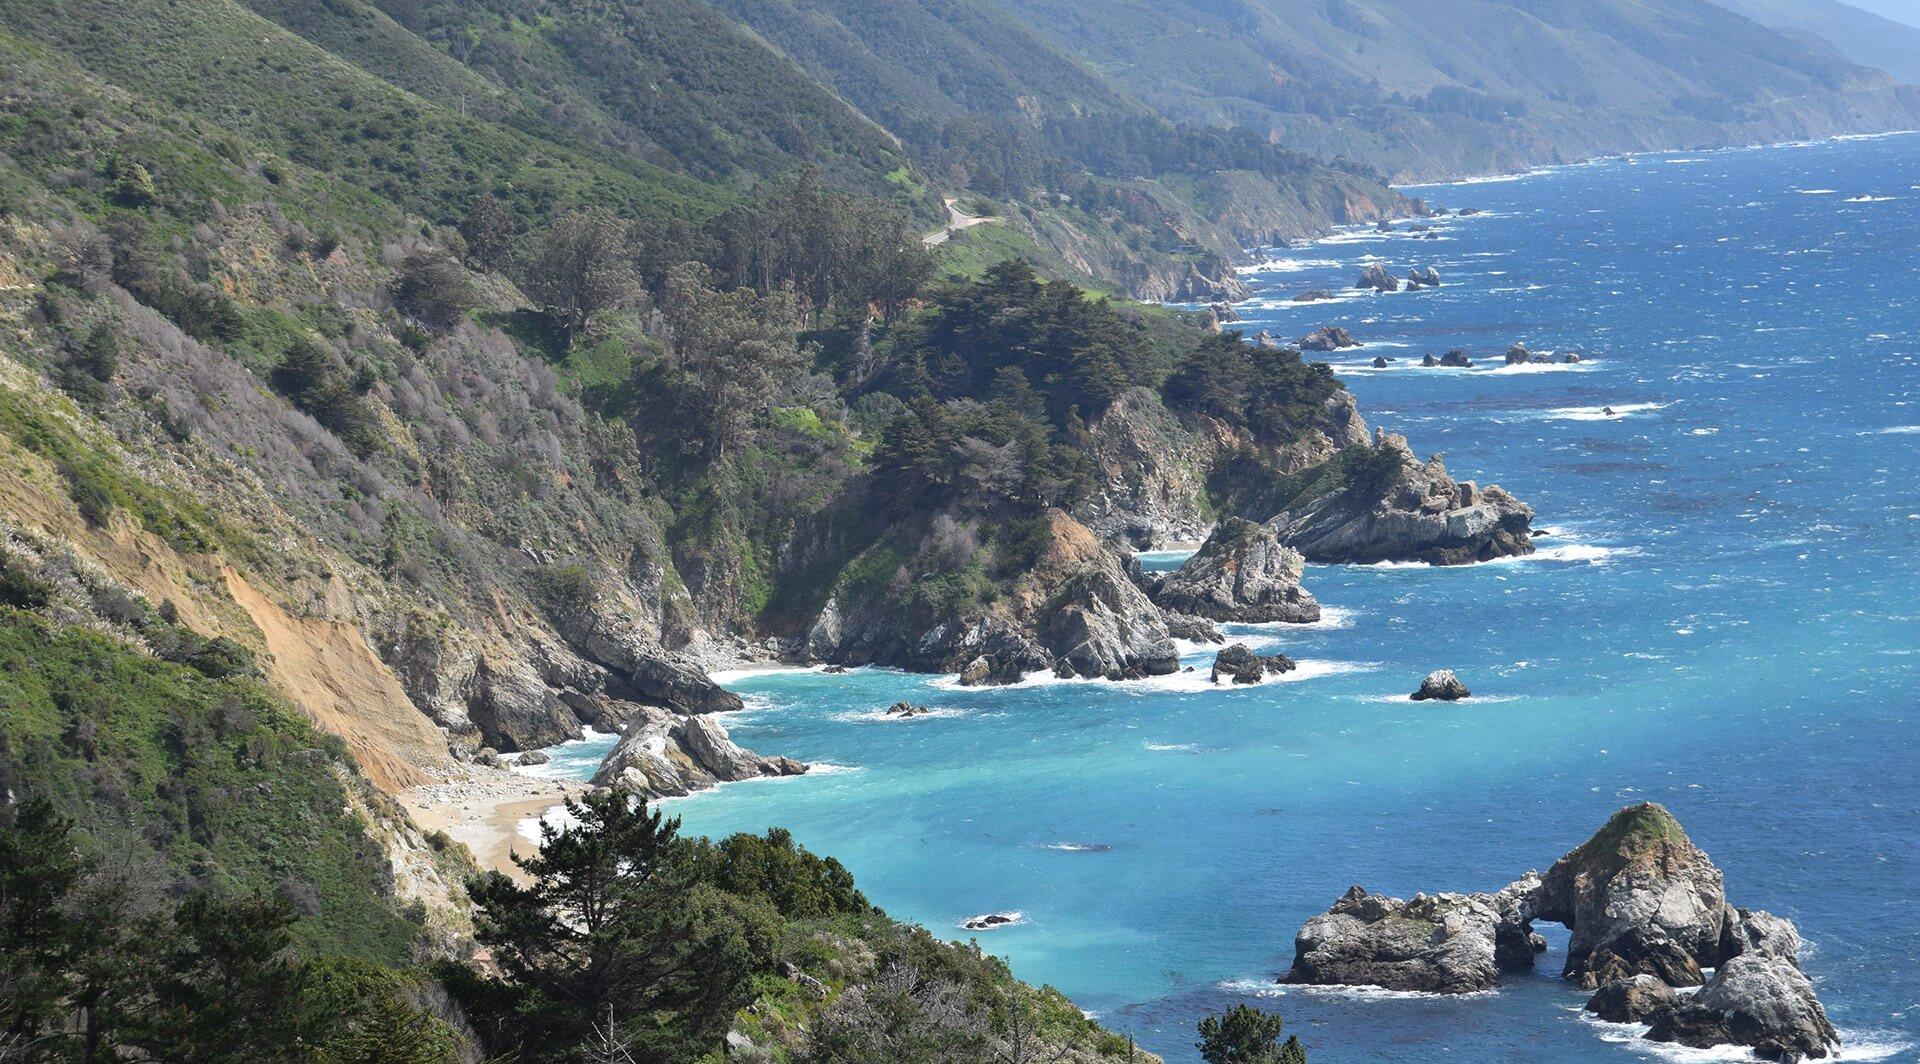 Craggy California coastline near Big Sur, California